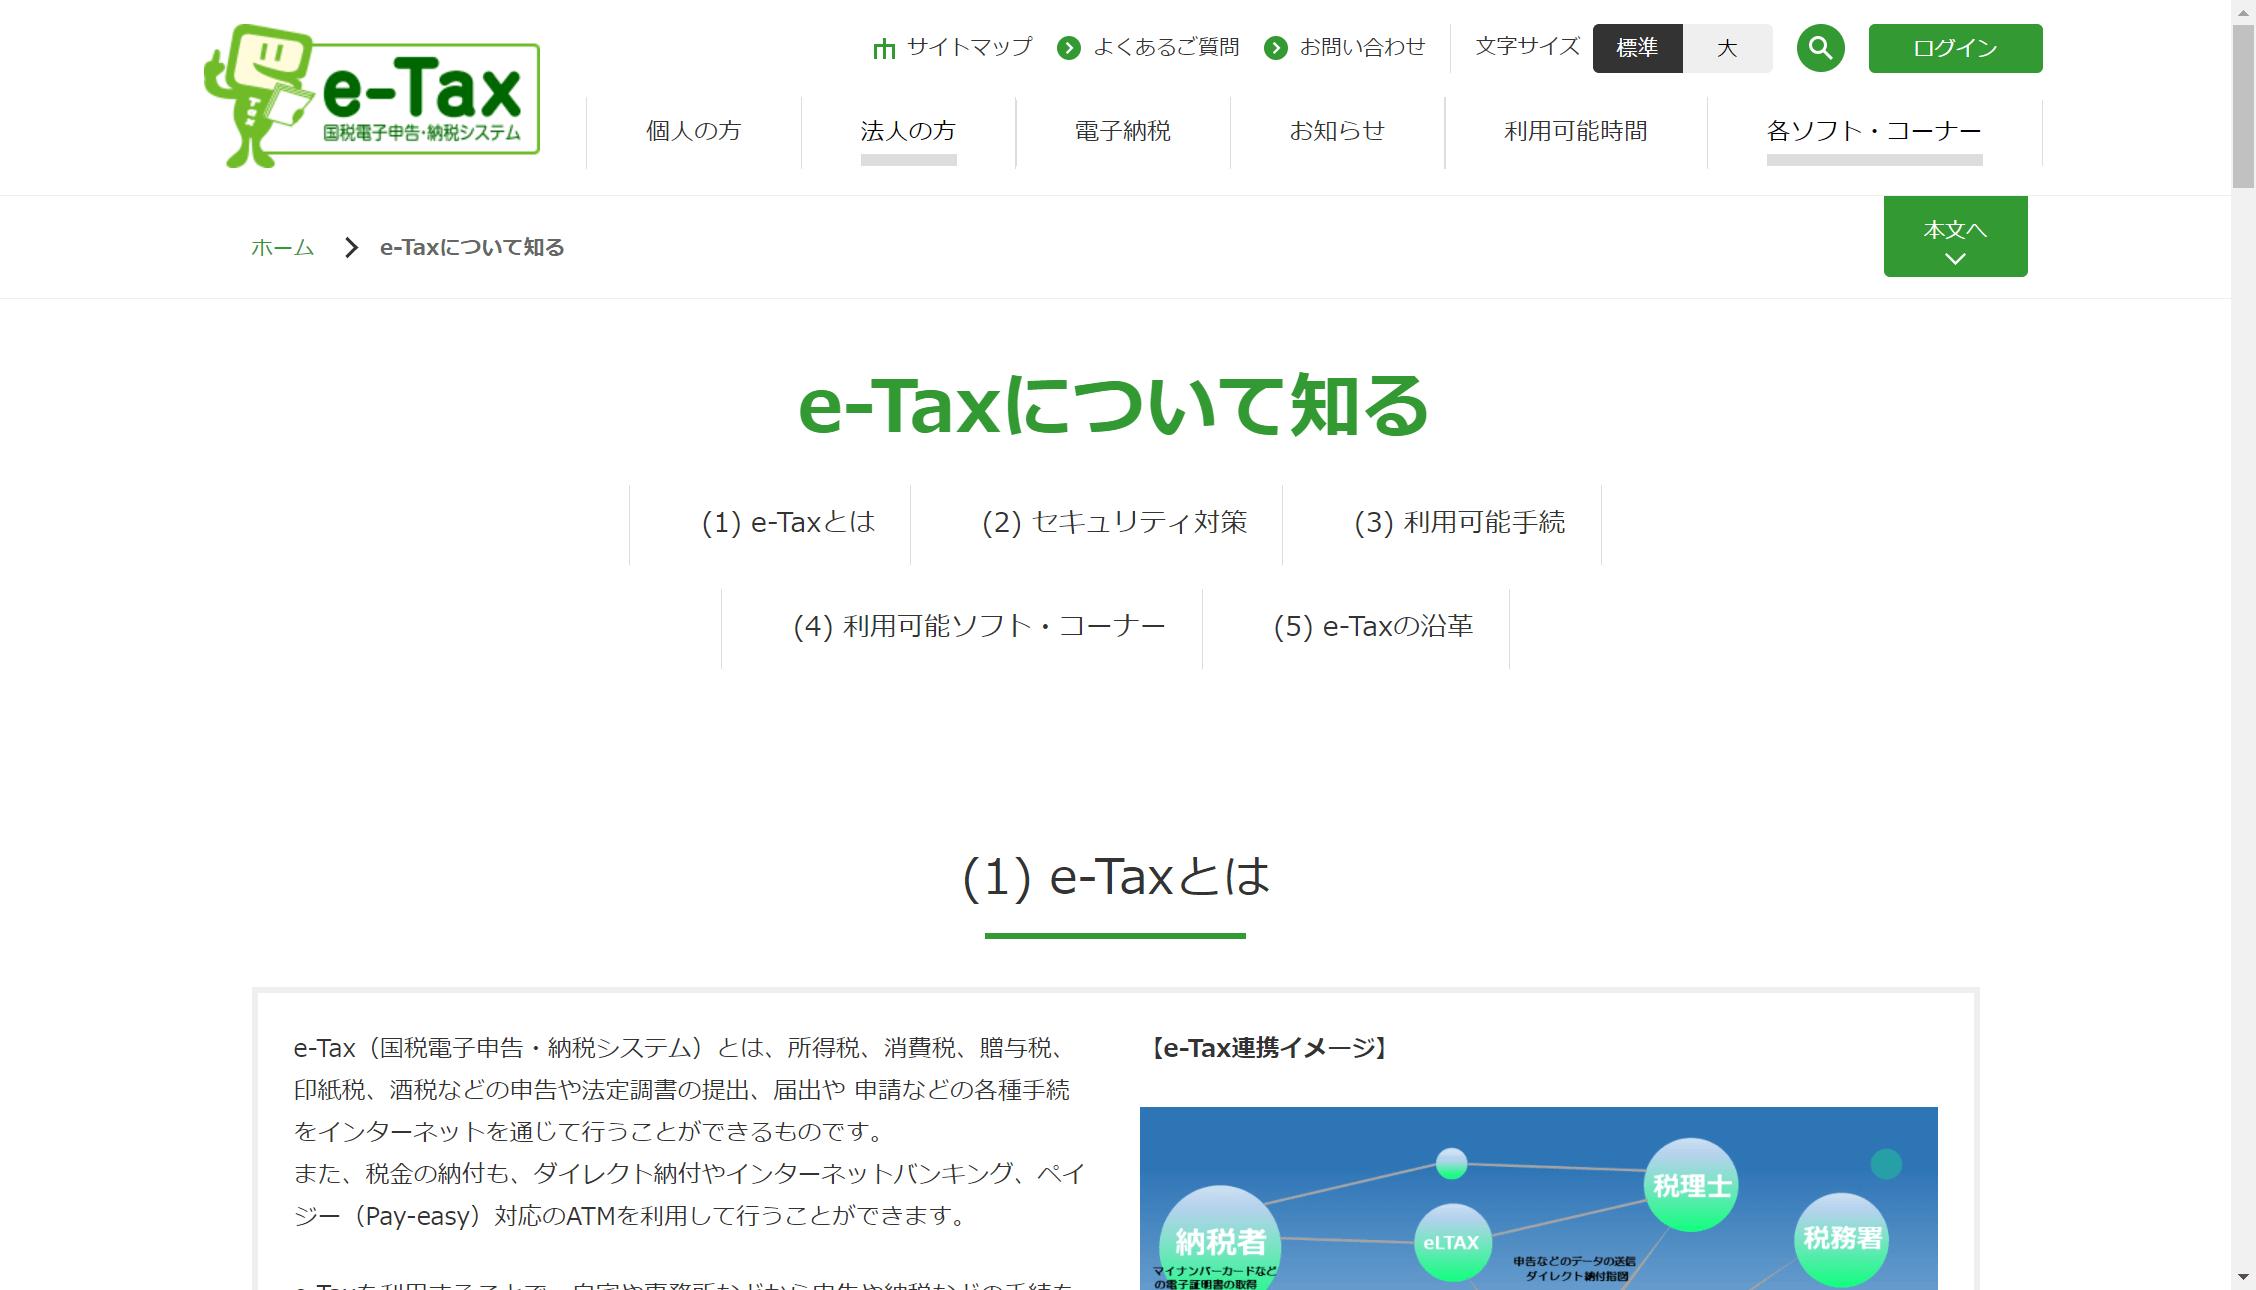 e-Taxの準備